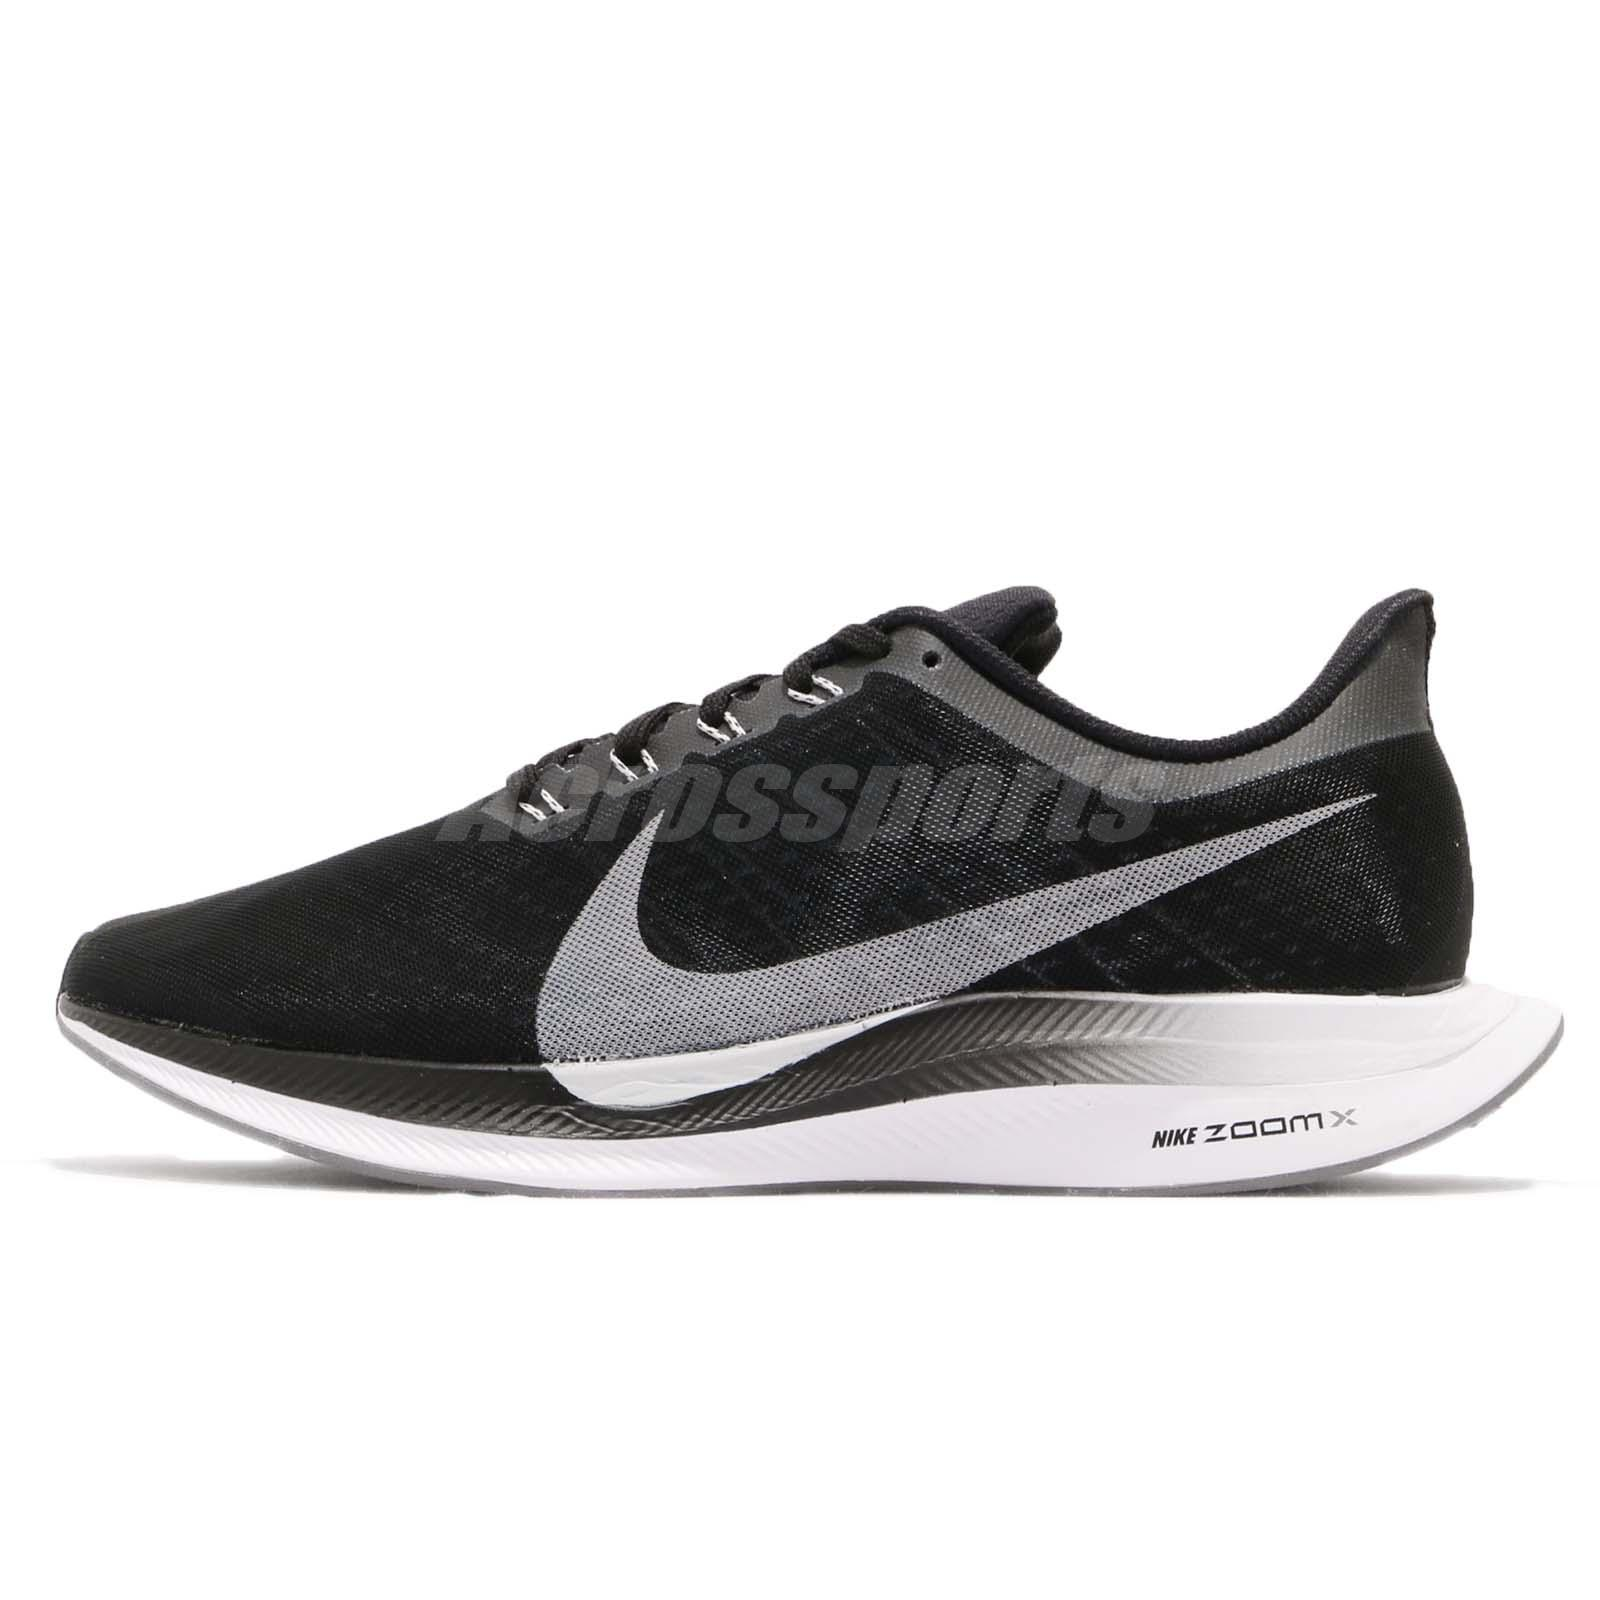 Details about Nike Zoom Pegasus 35 Turbo Black Vast Grey ZoomX Men Running Shoes AJ4114 001